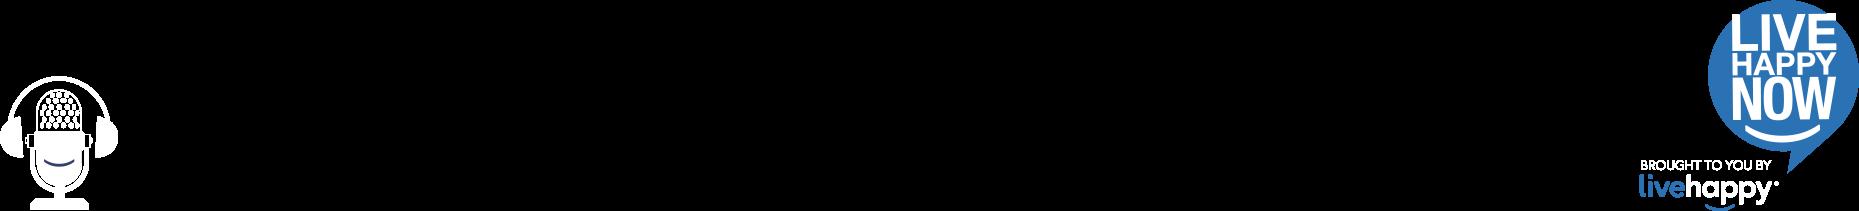 hero-brink-midnigth-icon.png